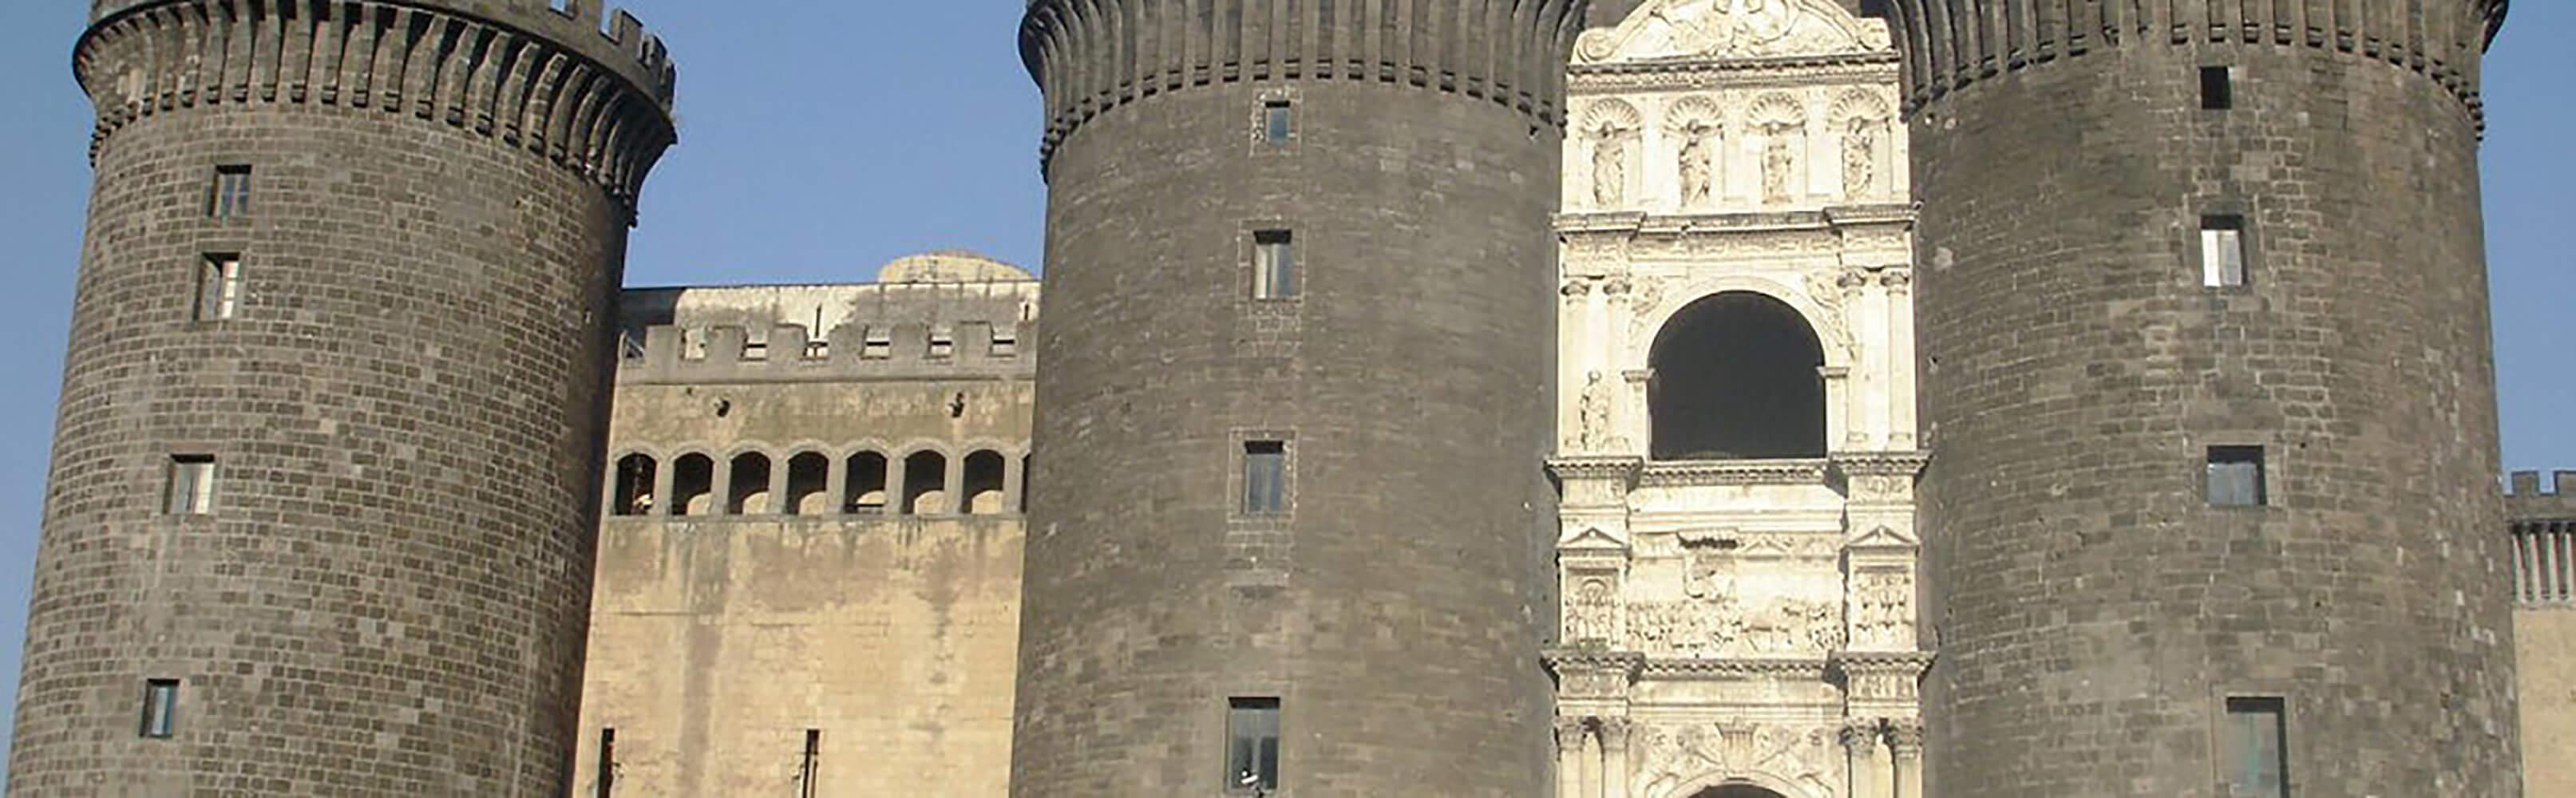 Castel Nuovo 1